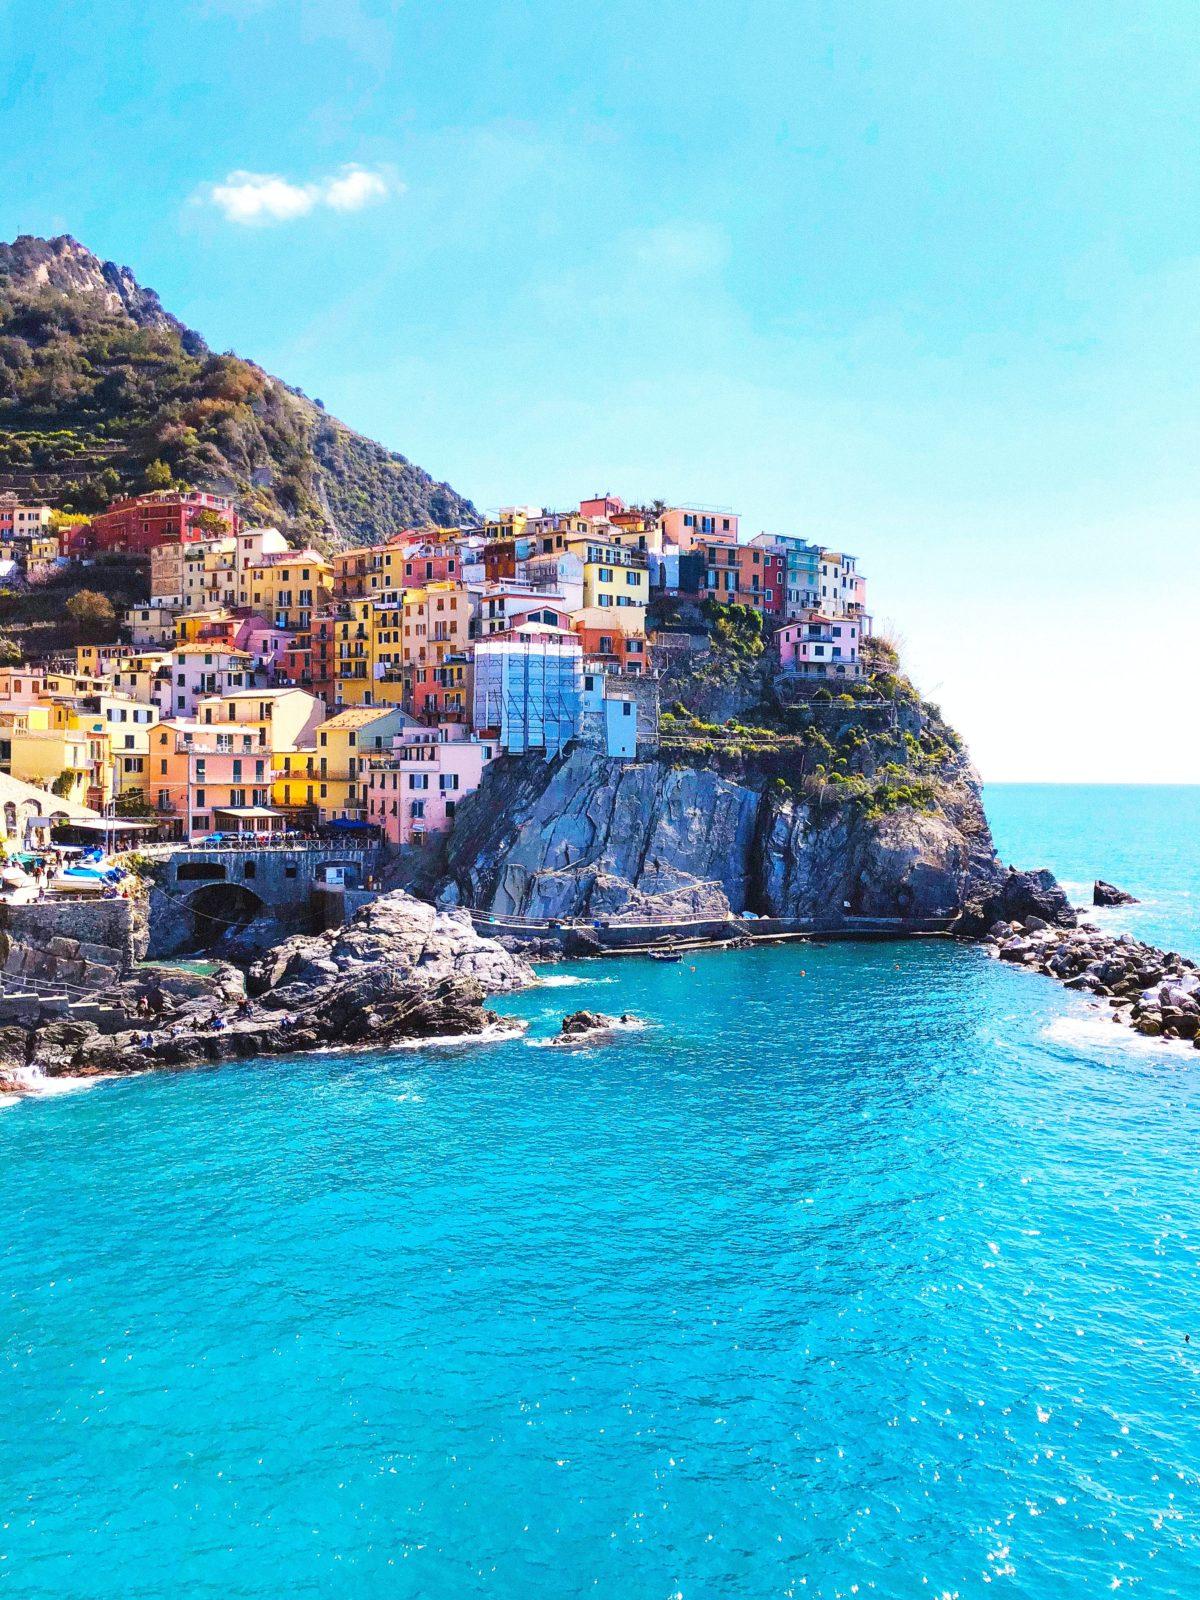 mooiste plekken in italië